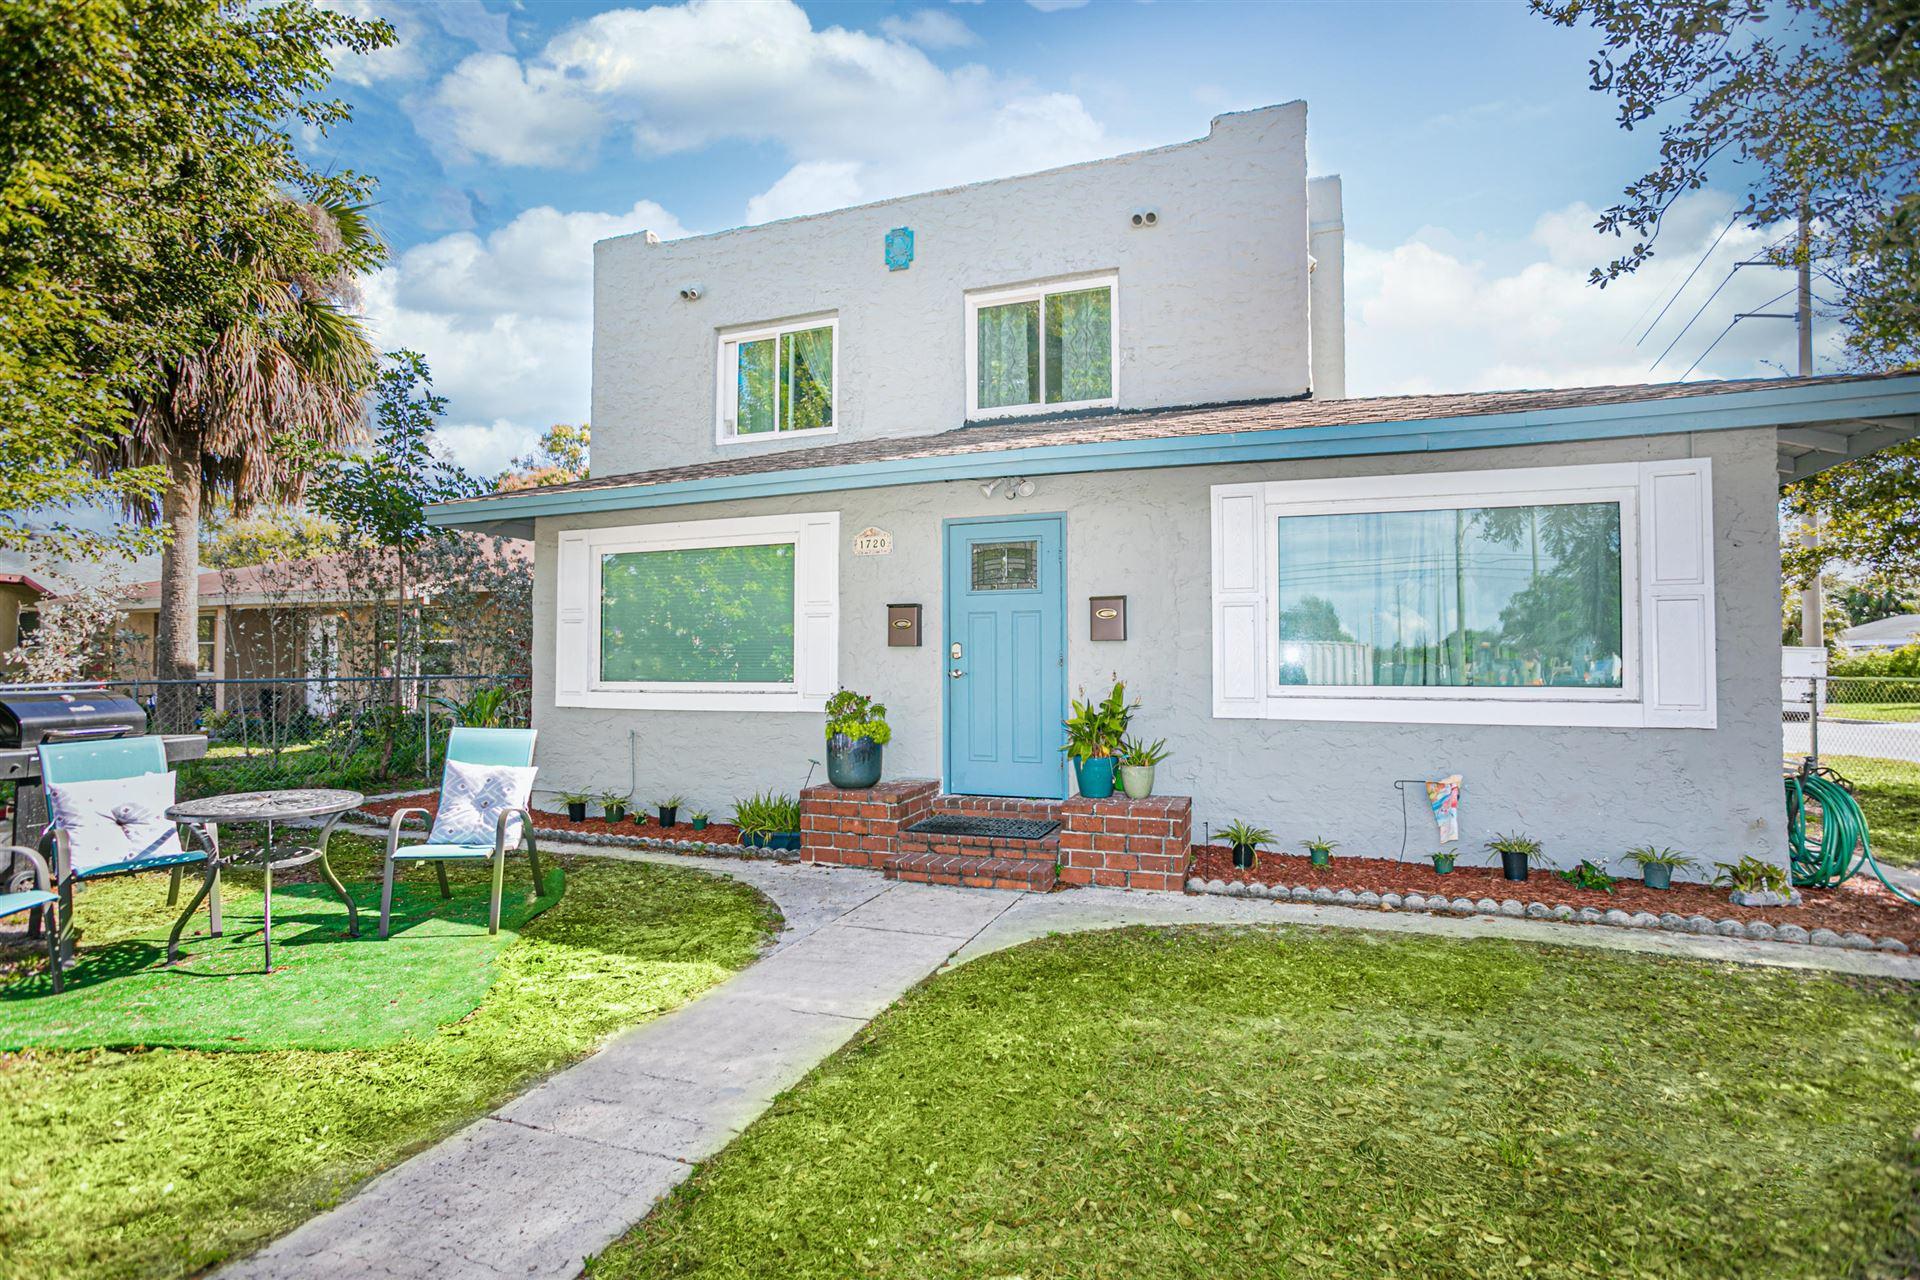 1720 Mercer Avenue, West Palm Beach, FL 33401 - #: RX-10639550